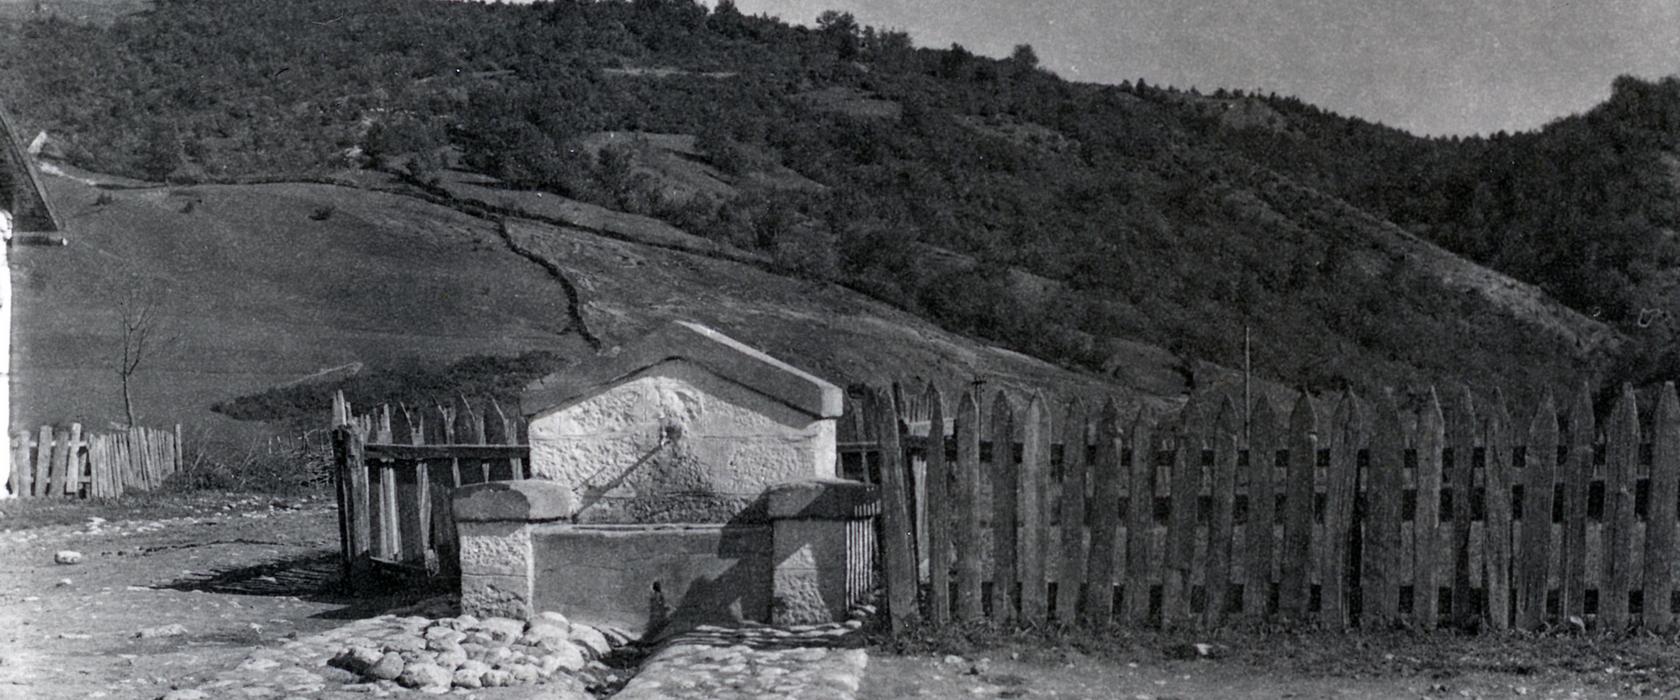 Tnovo 1956.